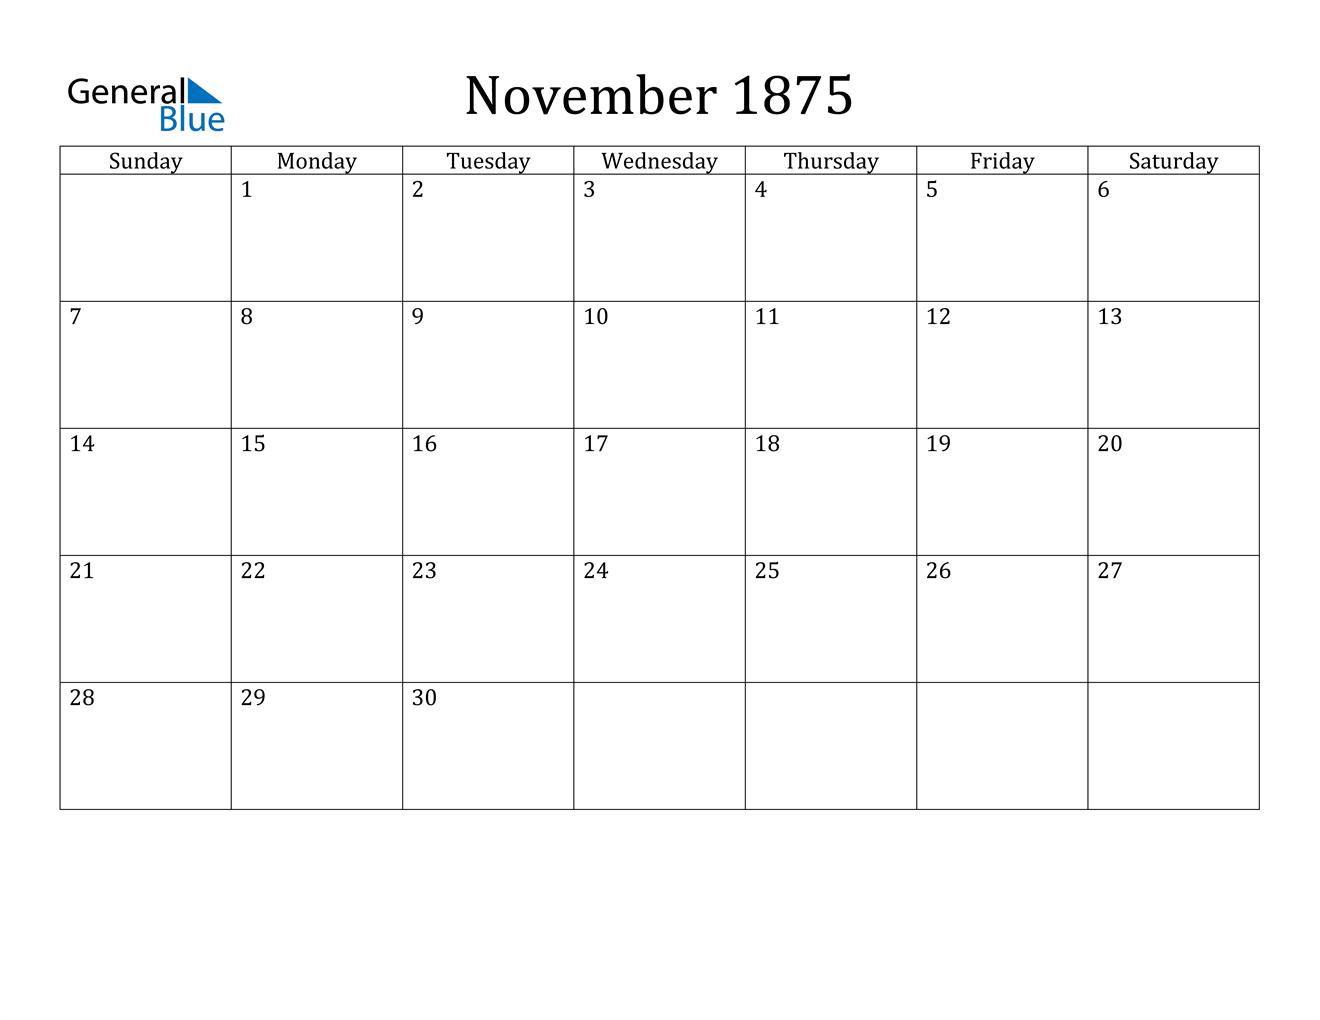 Image of November 1875 Calendar